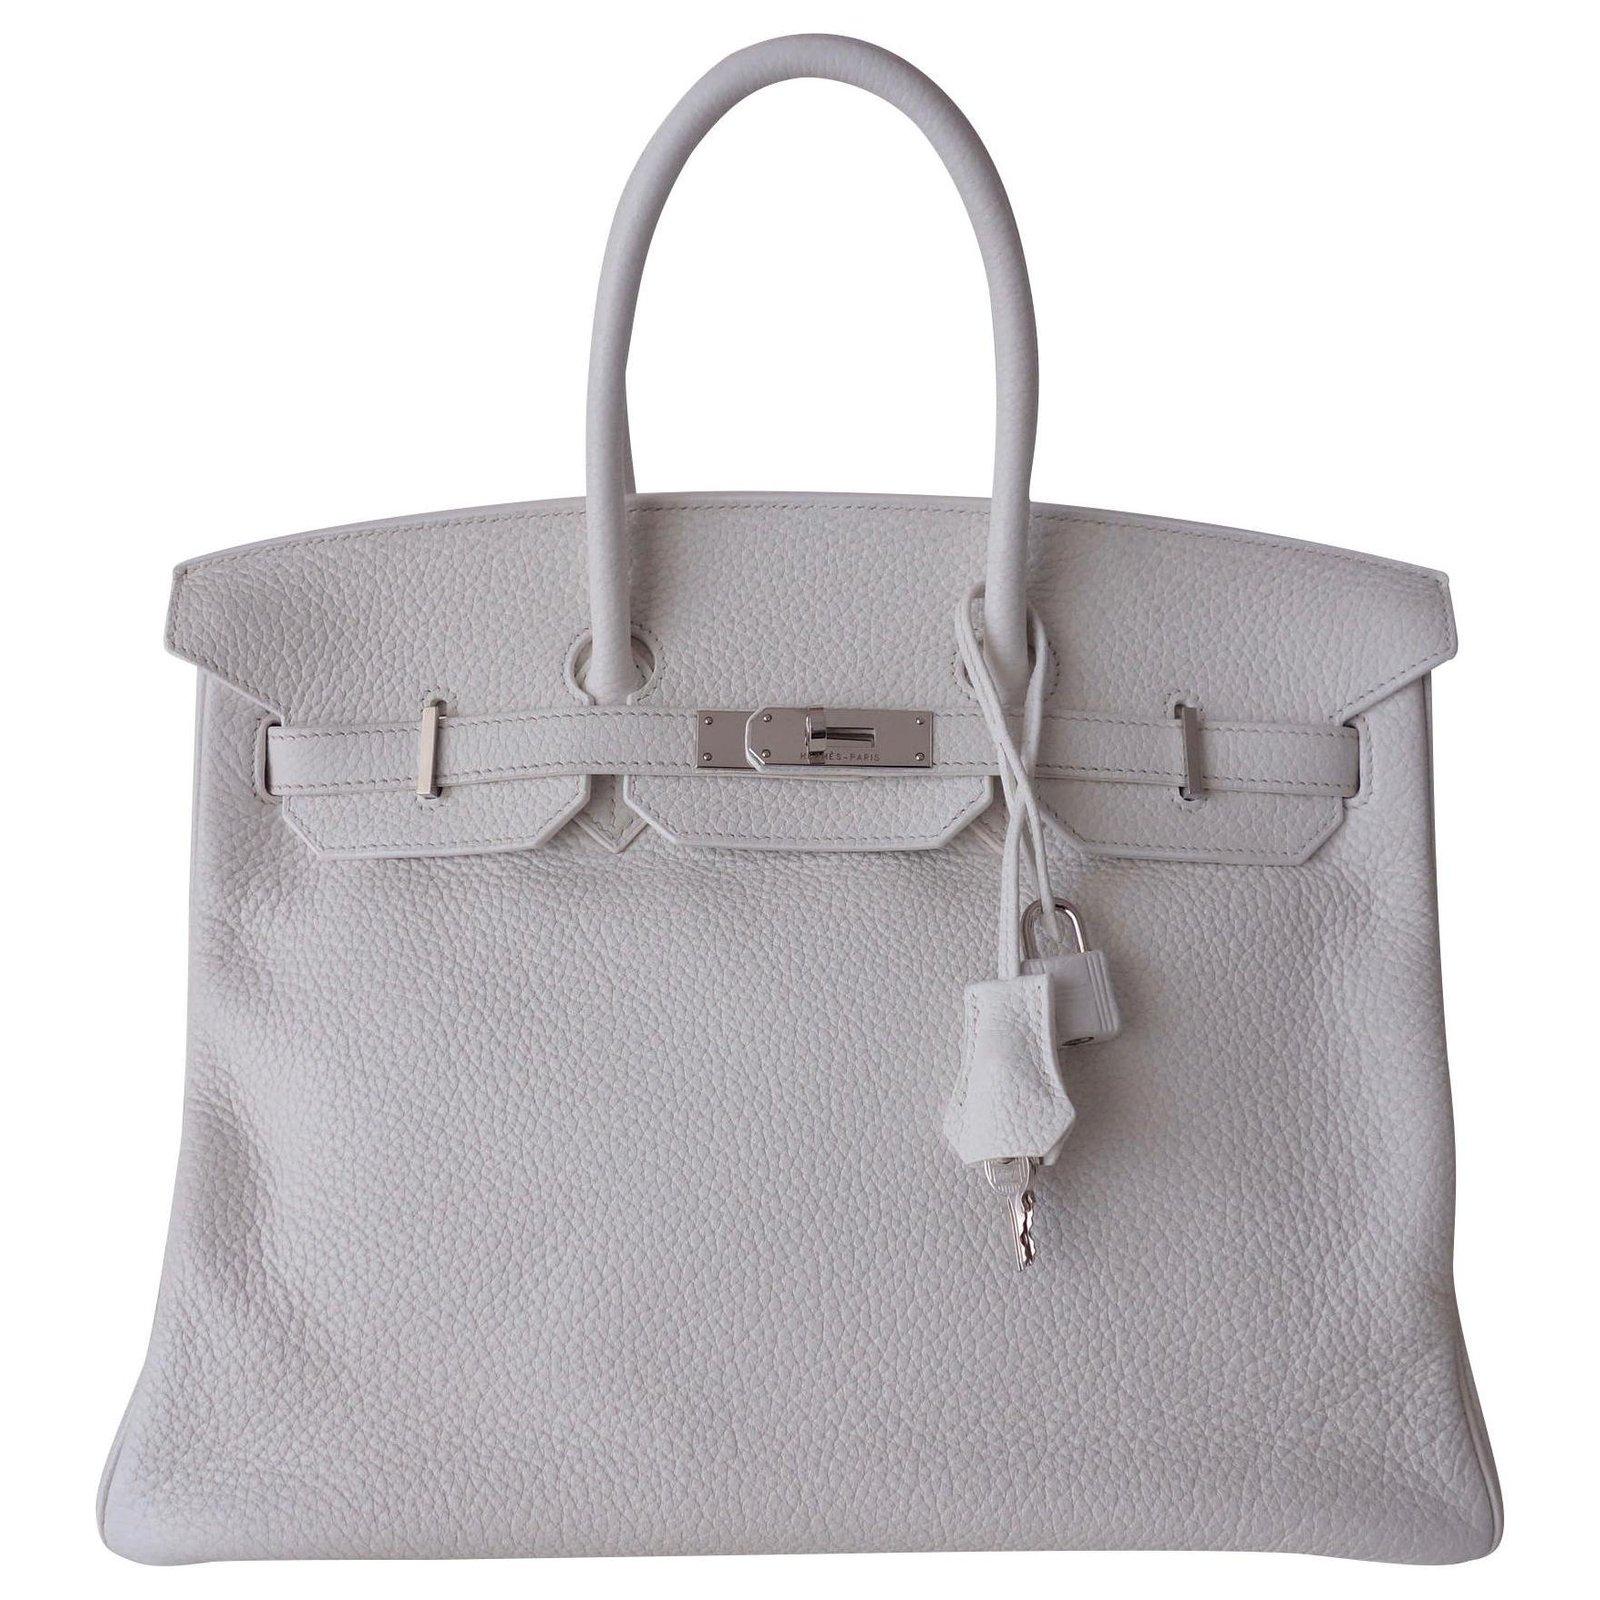 Hermes Birkin Bag 35 Handbags Leather